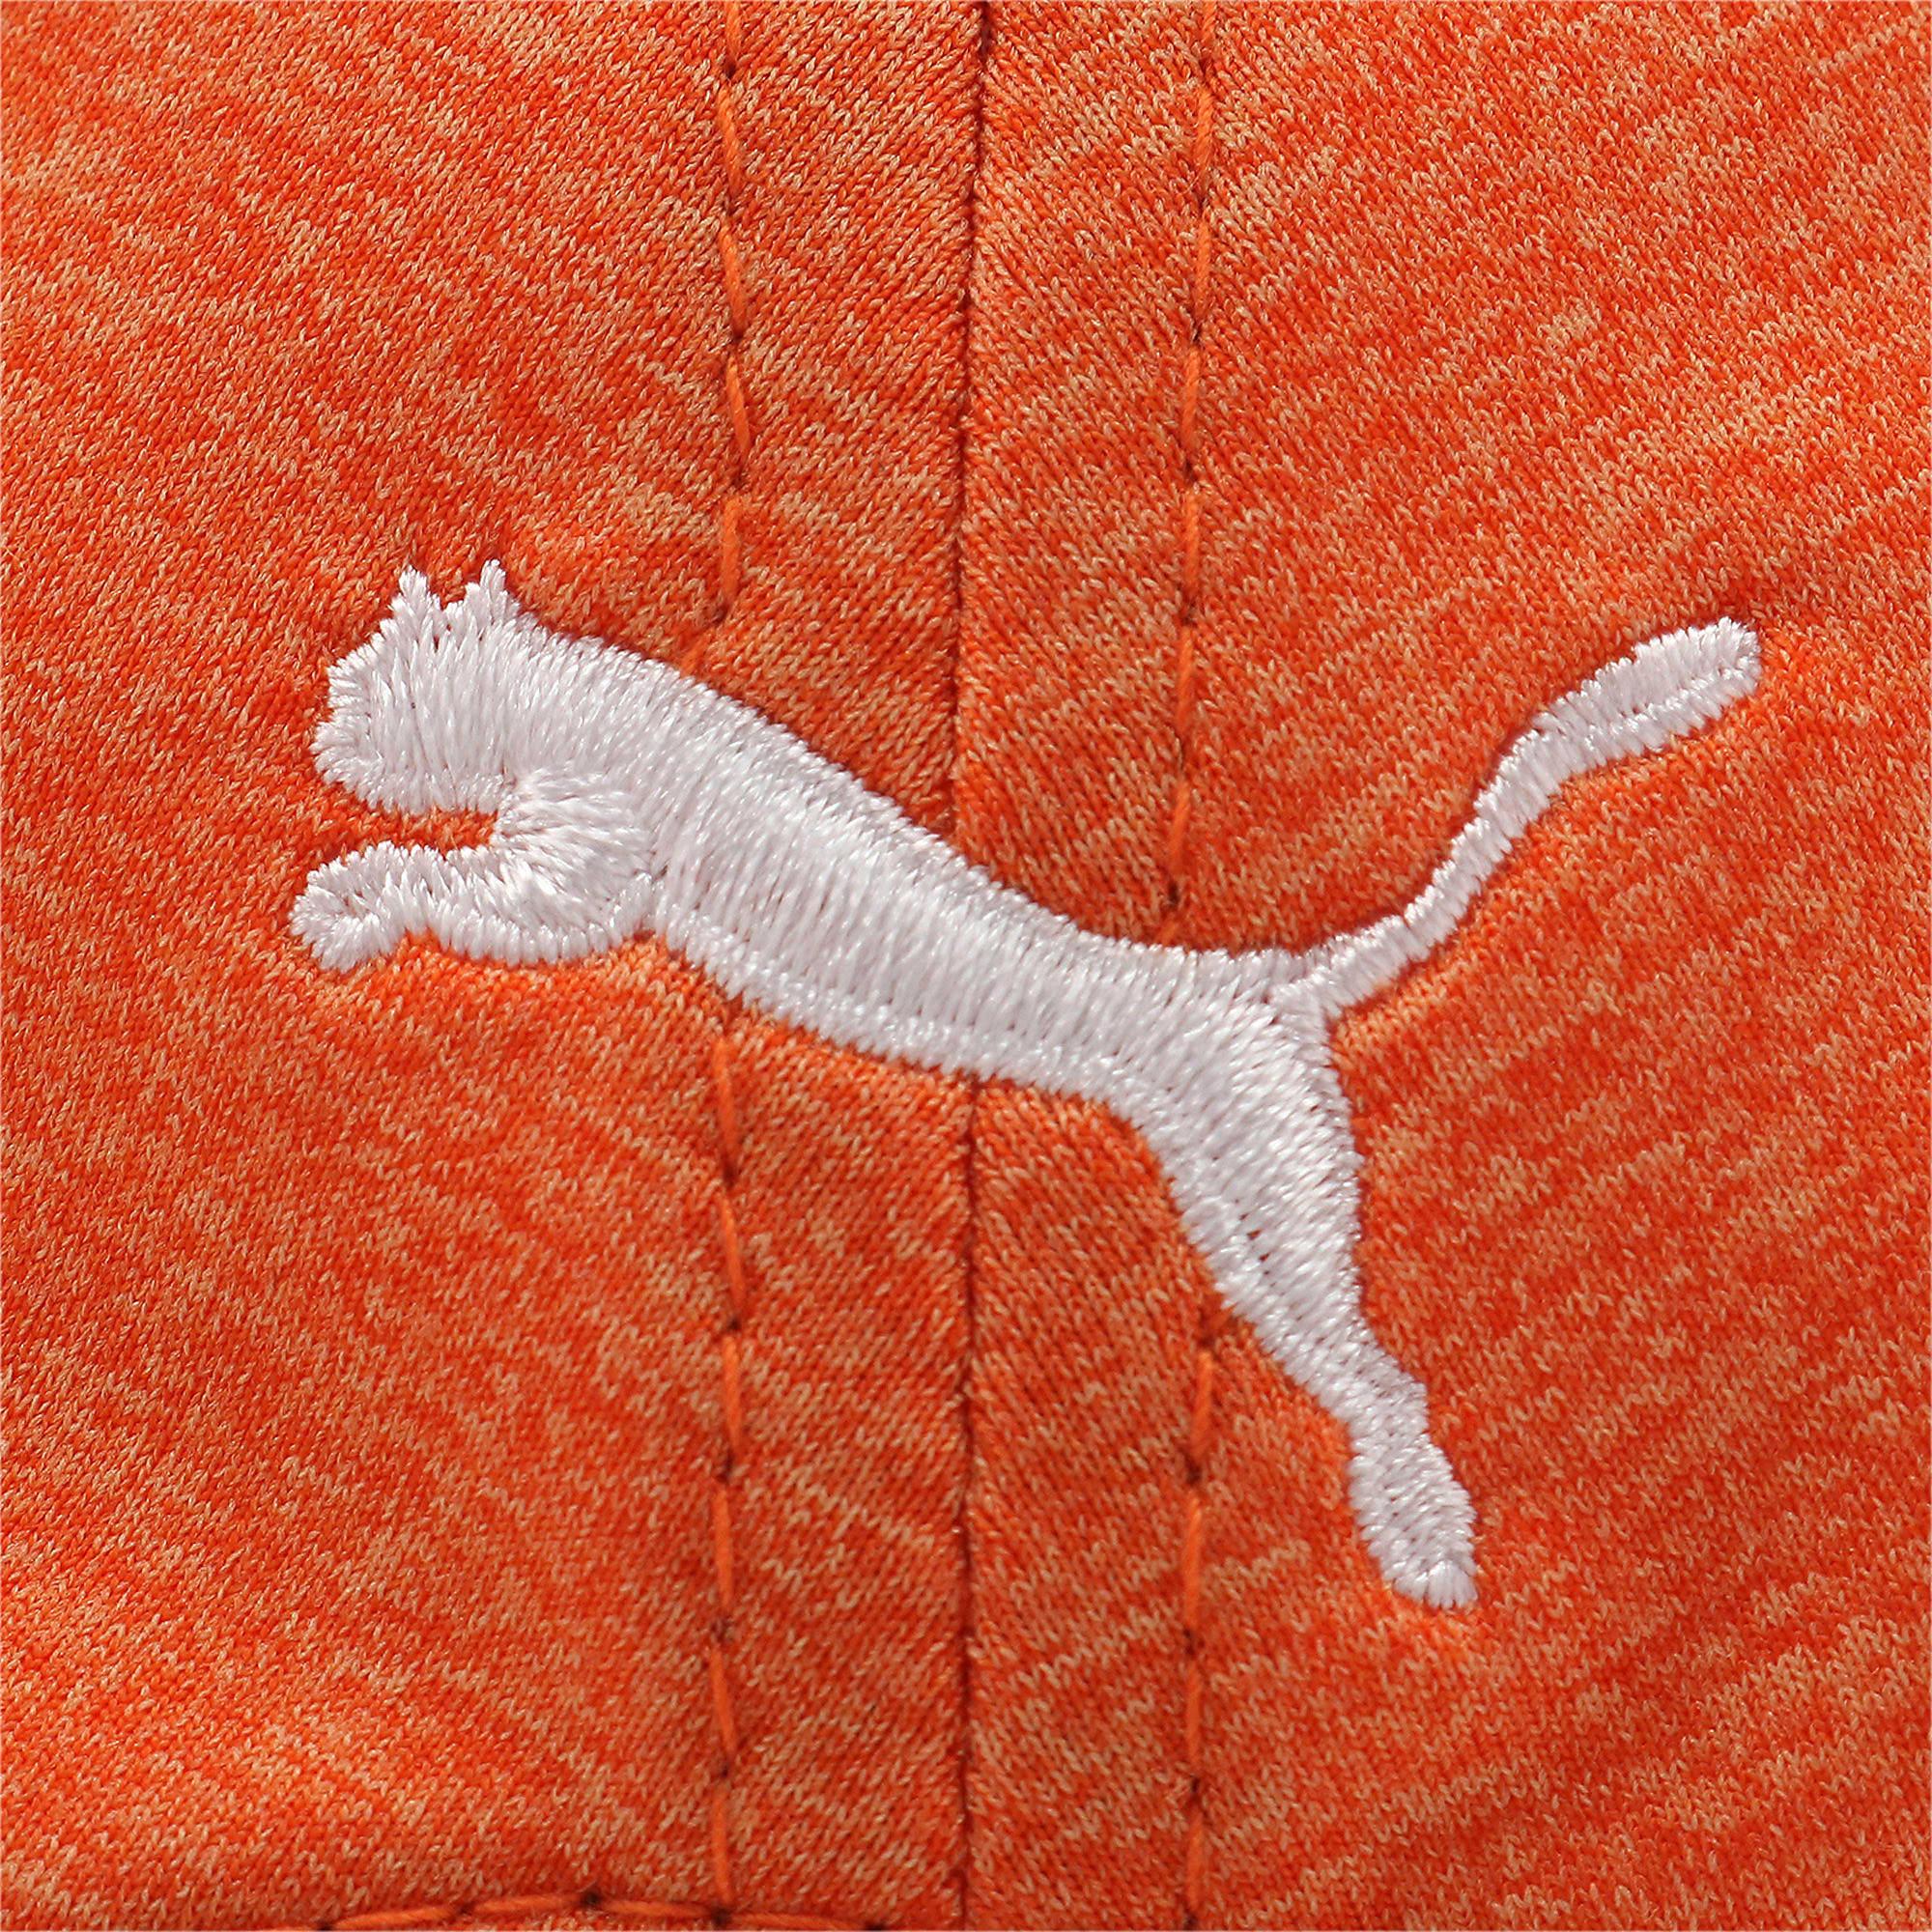 Thumbnail 4 of ゴルフ Pマークスナップバックキャップ, Vibrant Orange, medium-JPN